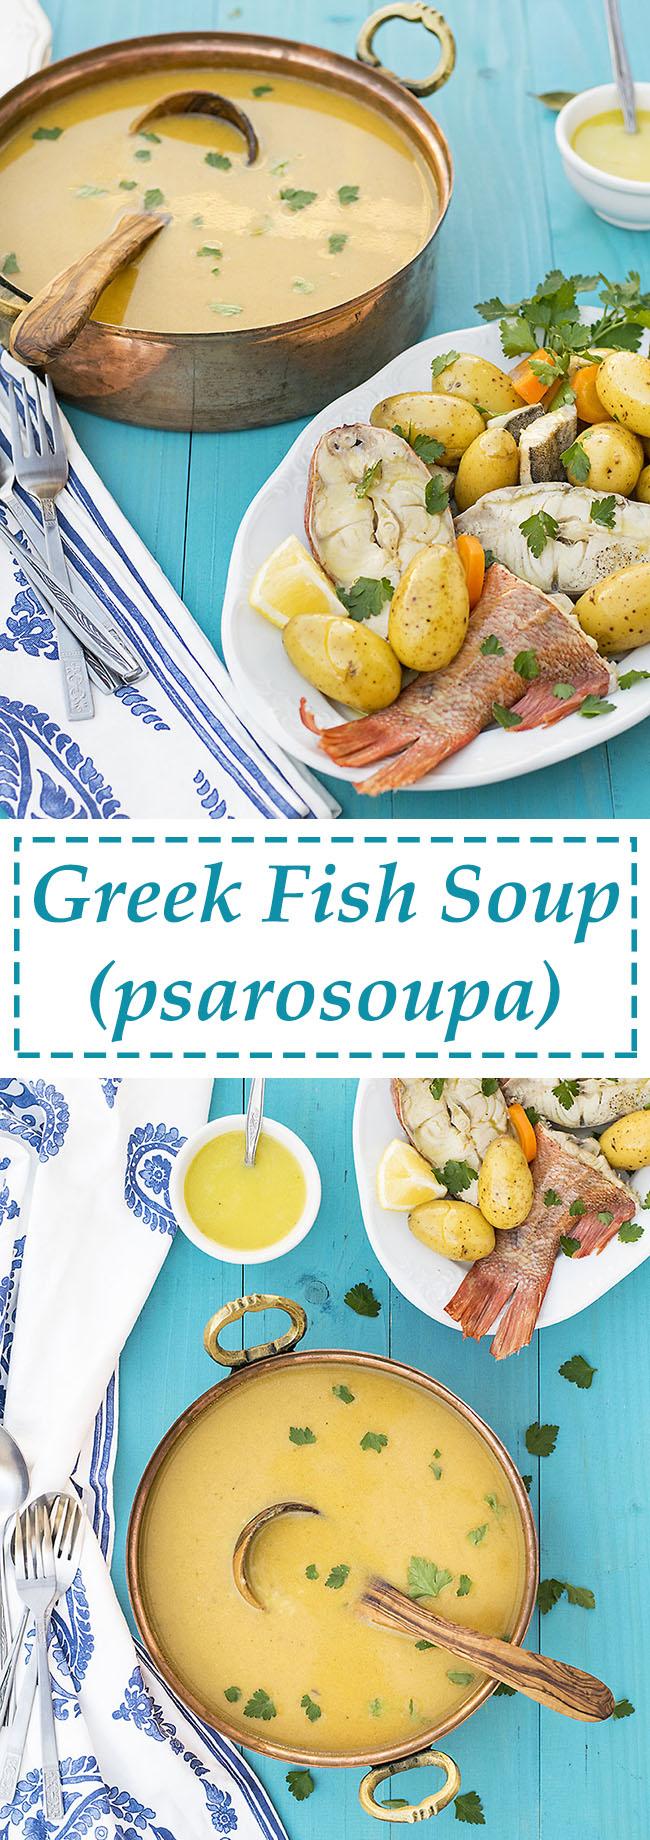 Greek fish soup with potatoes & vegetables (Psarosoupa) 6